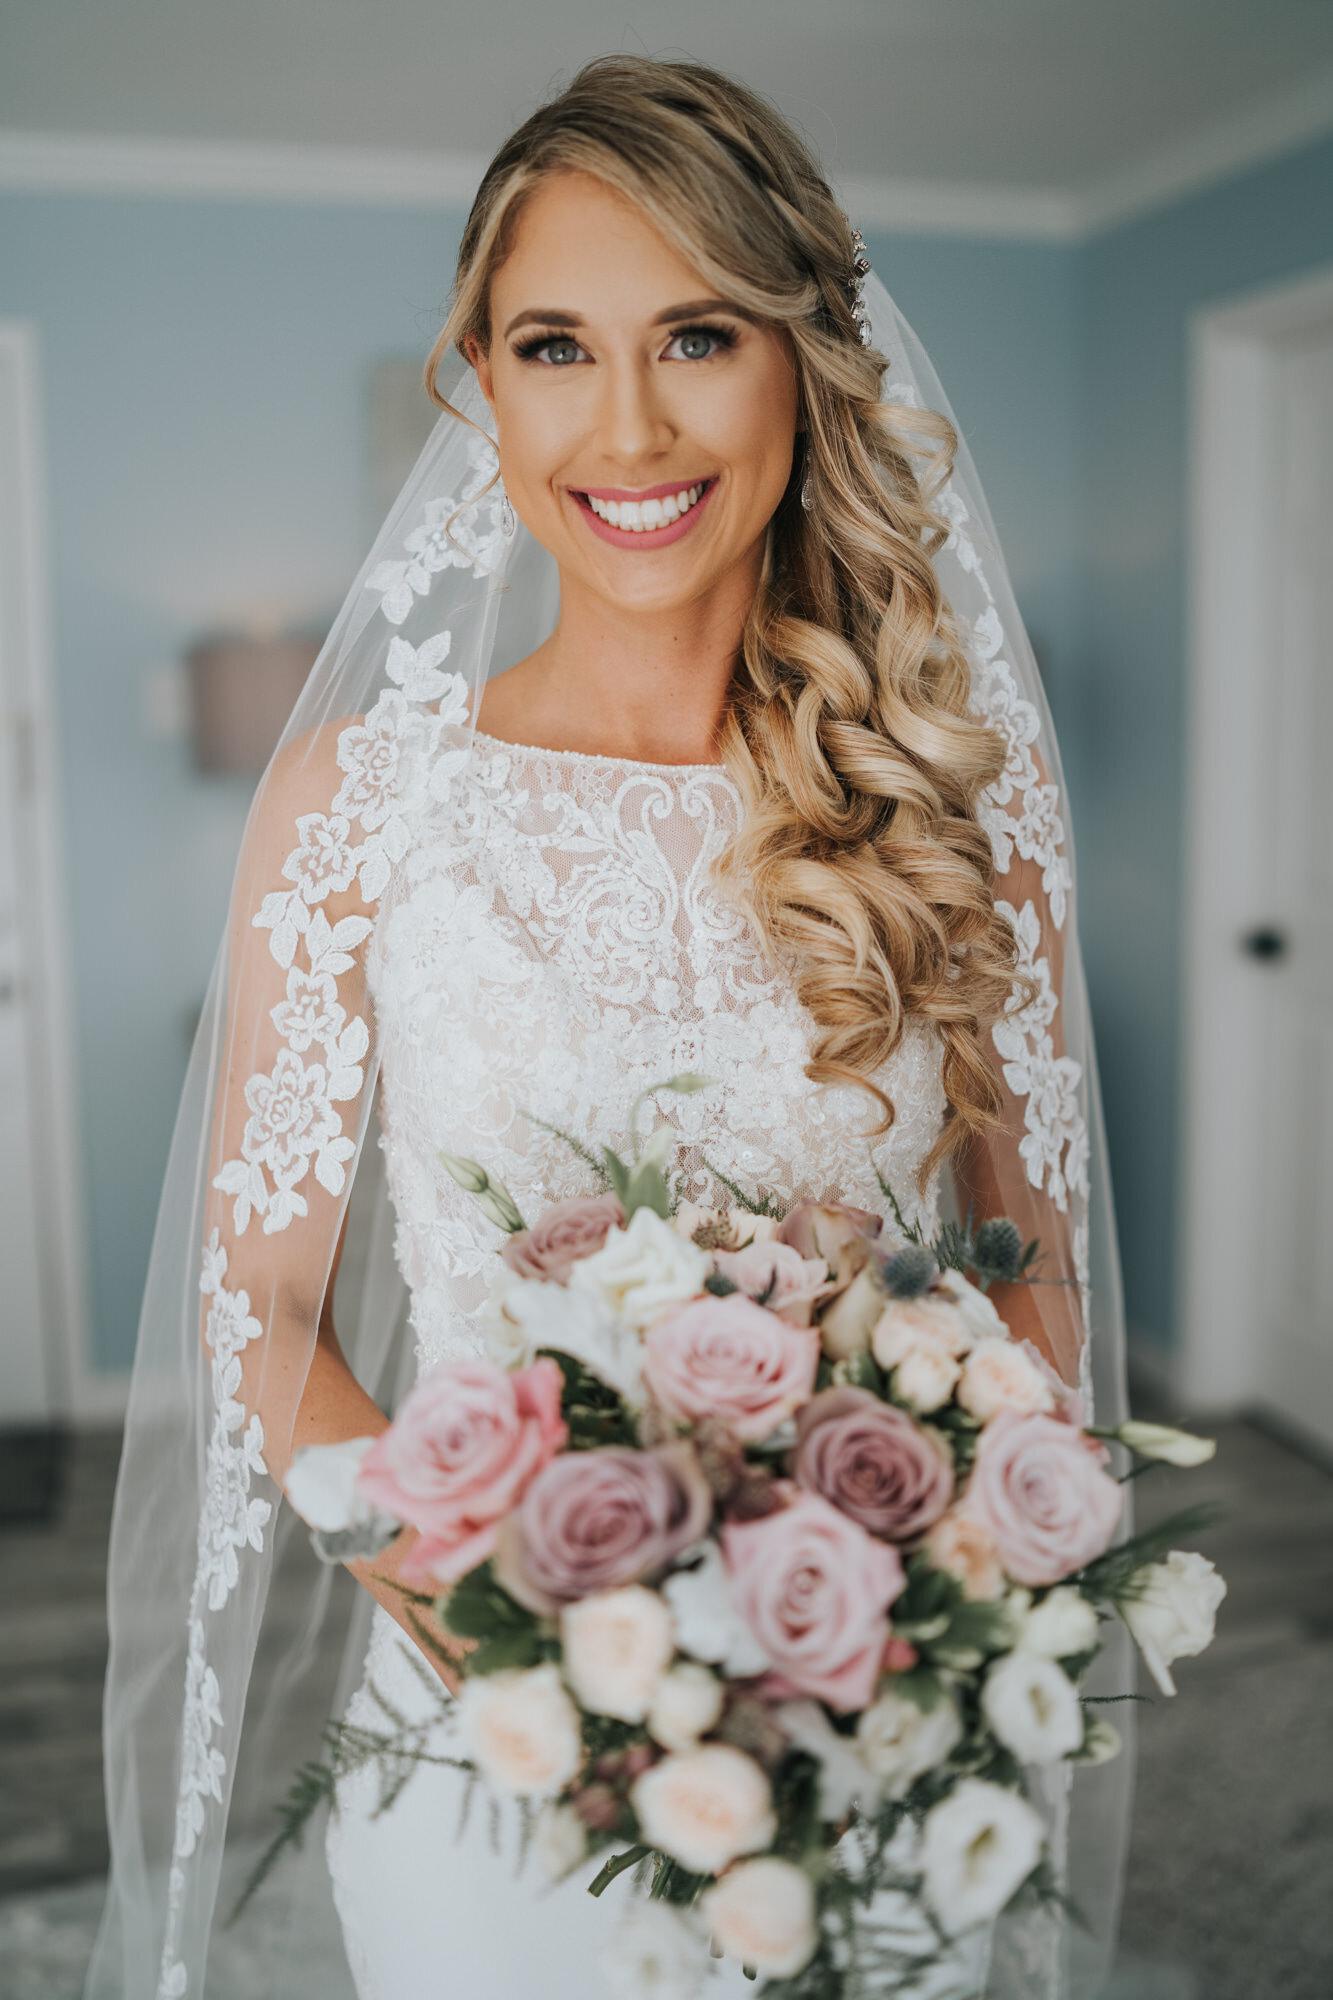 097Sean_Emily_Wedding_3-30-19.jpg